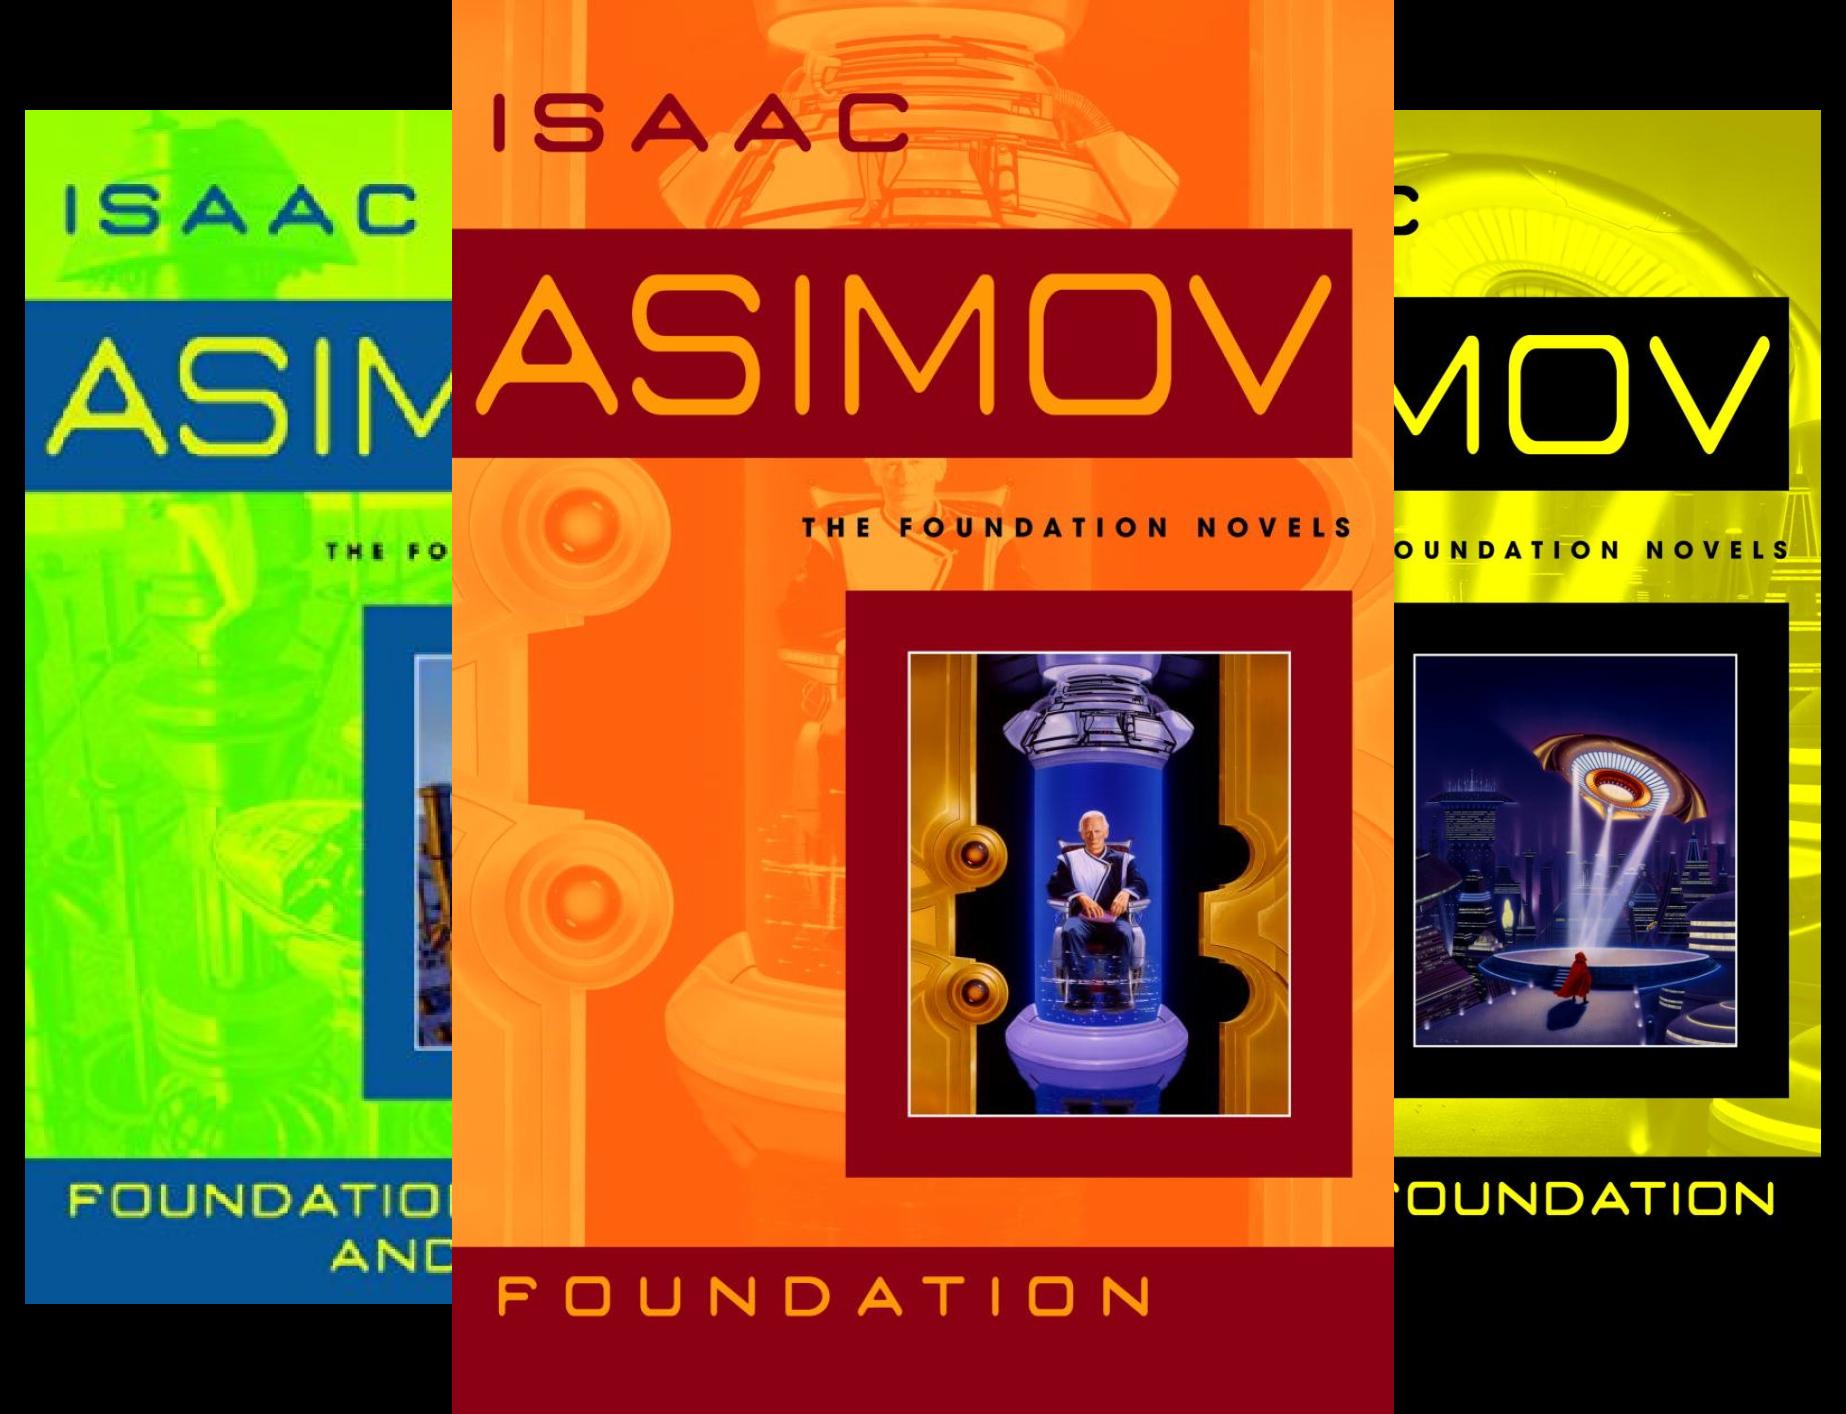 Foundation (1951 - 1993) (Book Series)